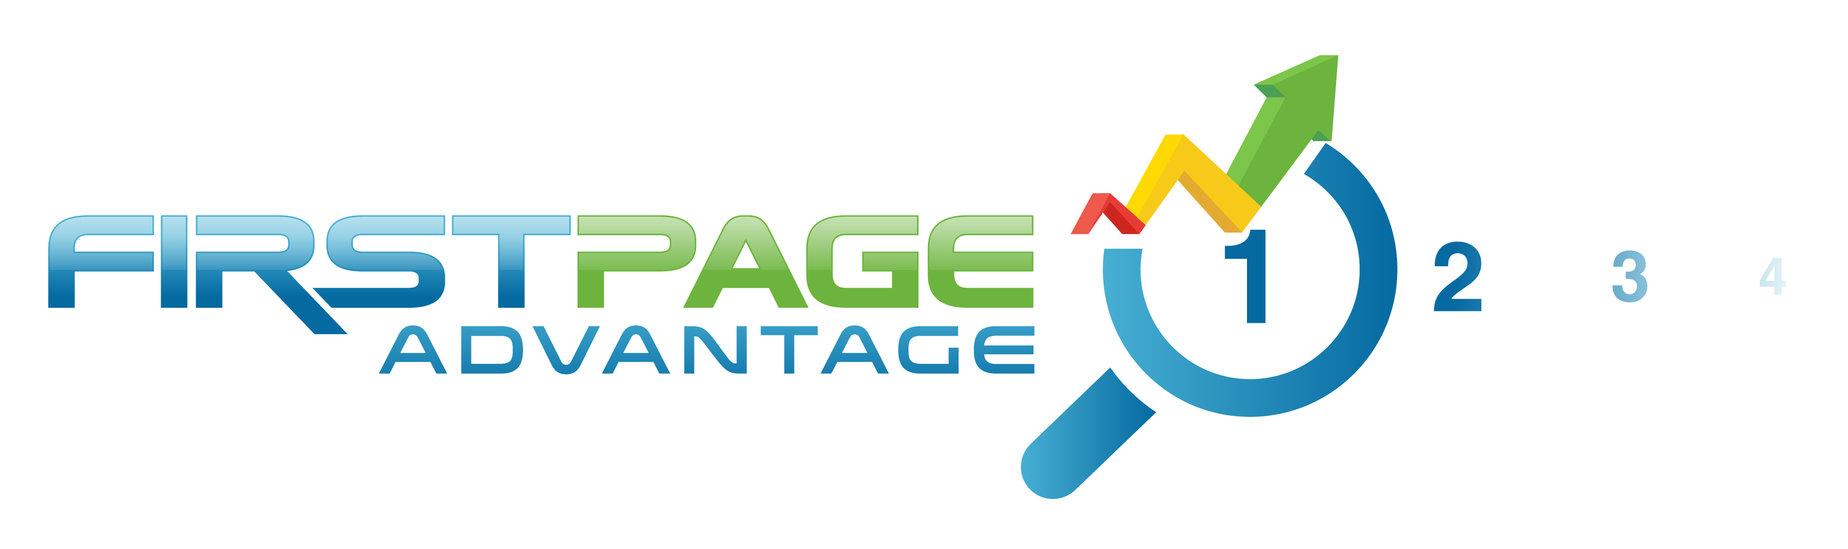 seo madison wi,internet marketing,digital marketing,internet advertising